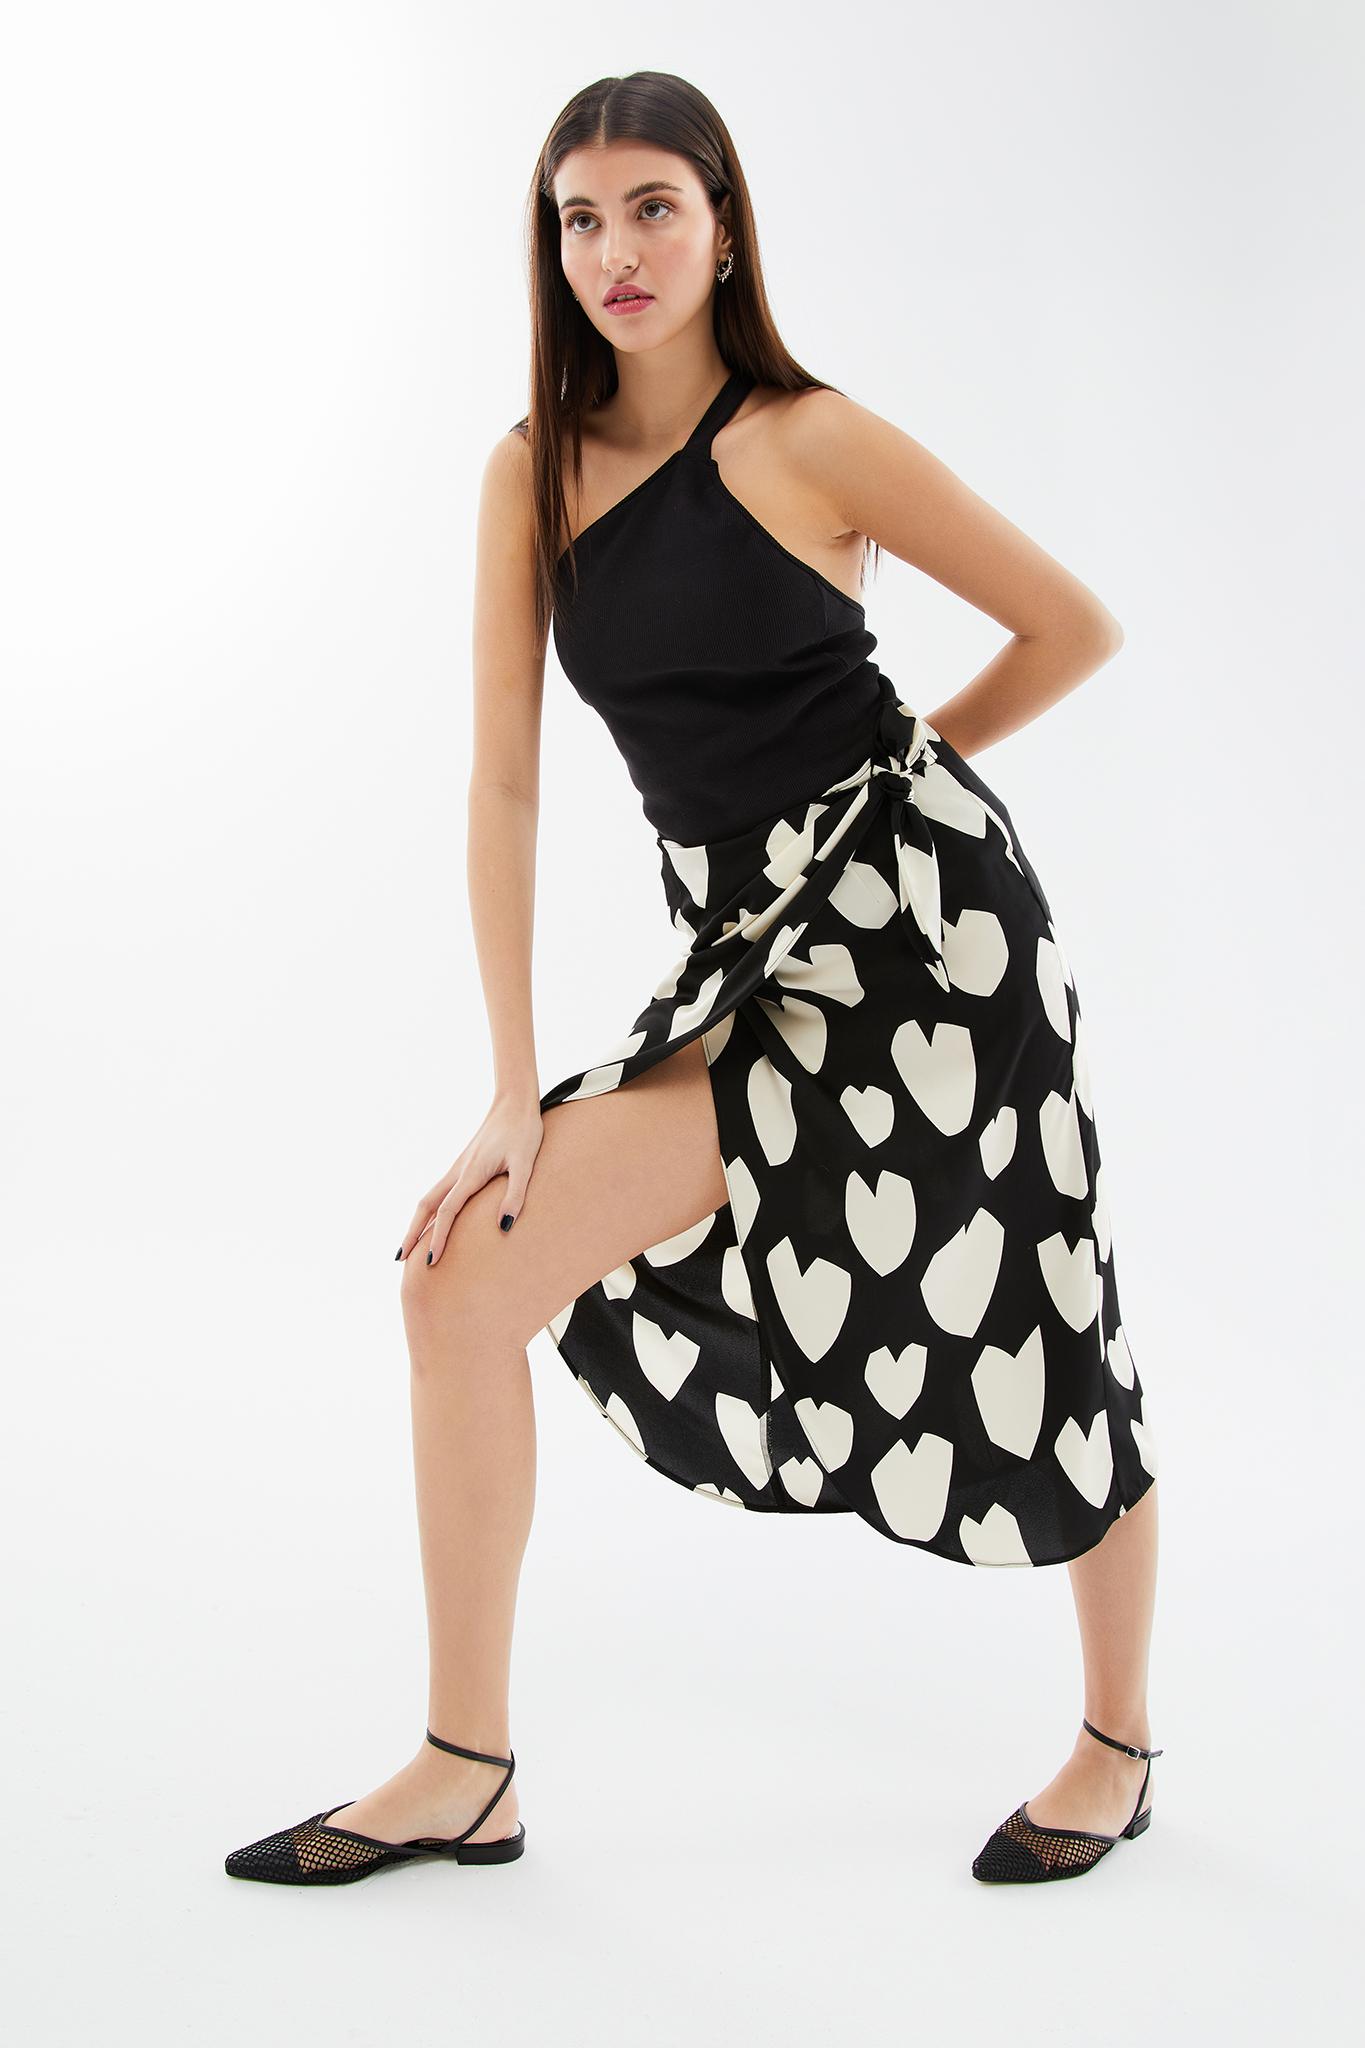 blameyourdaze printed skirt